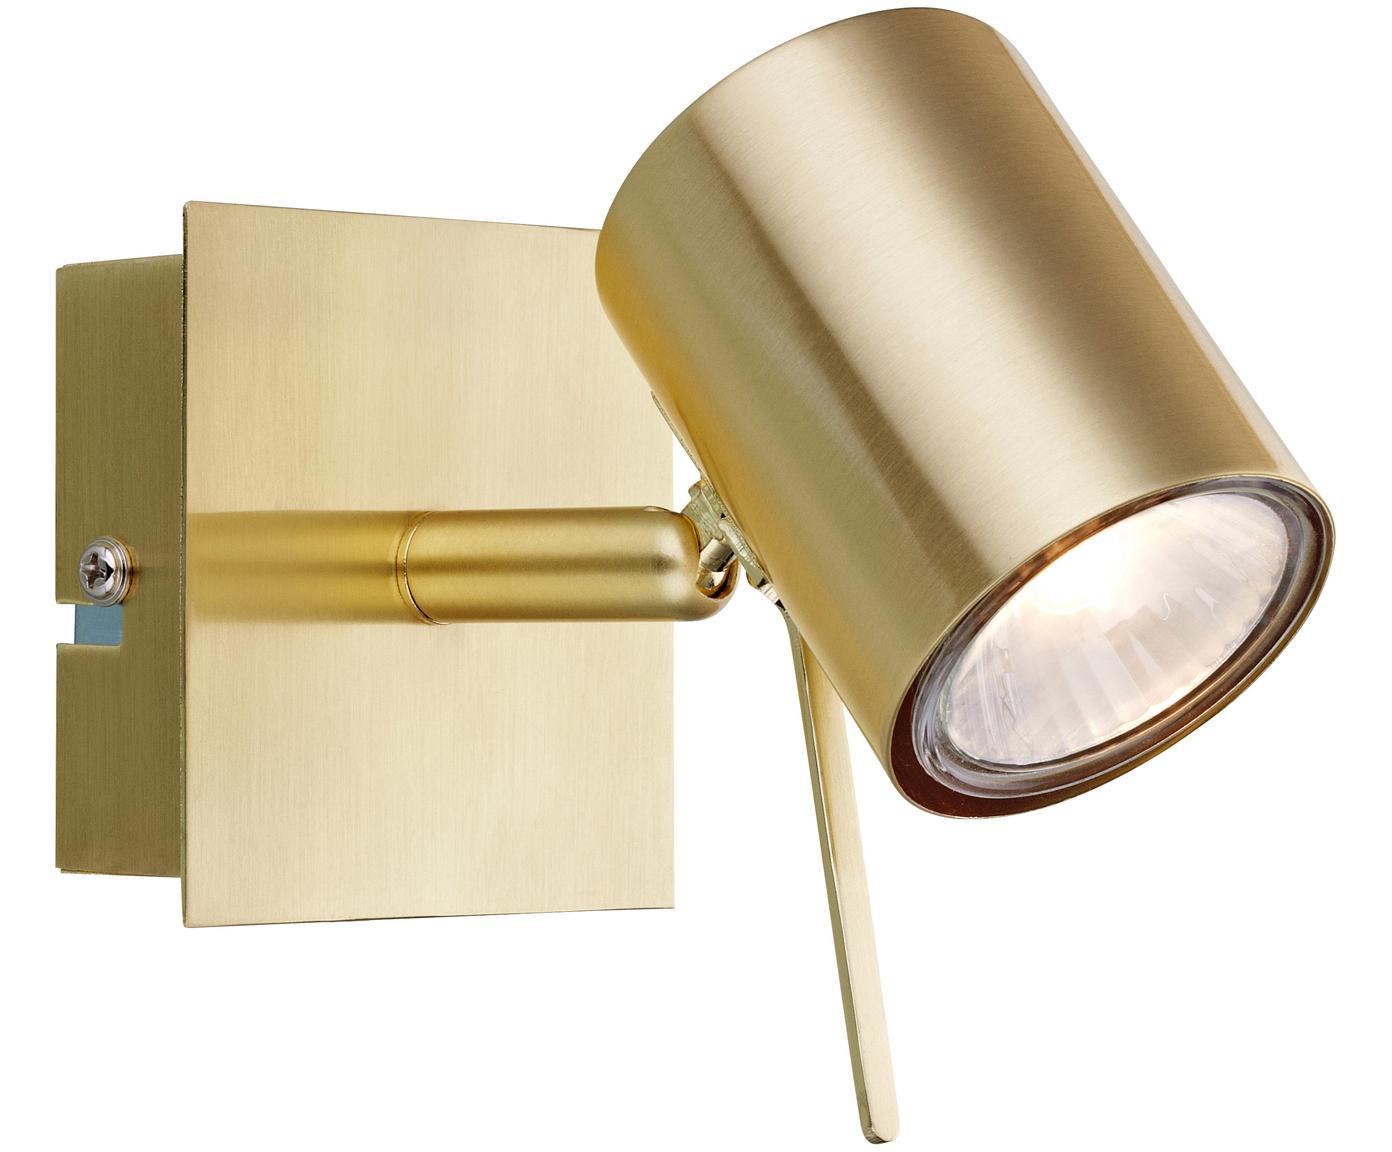 Wandleuchte Hyssna mit Stecker, Metall, vermessingt, gebürstet, Messing, 8 x 9 cm